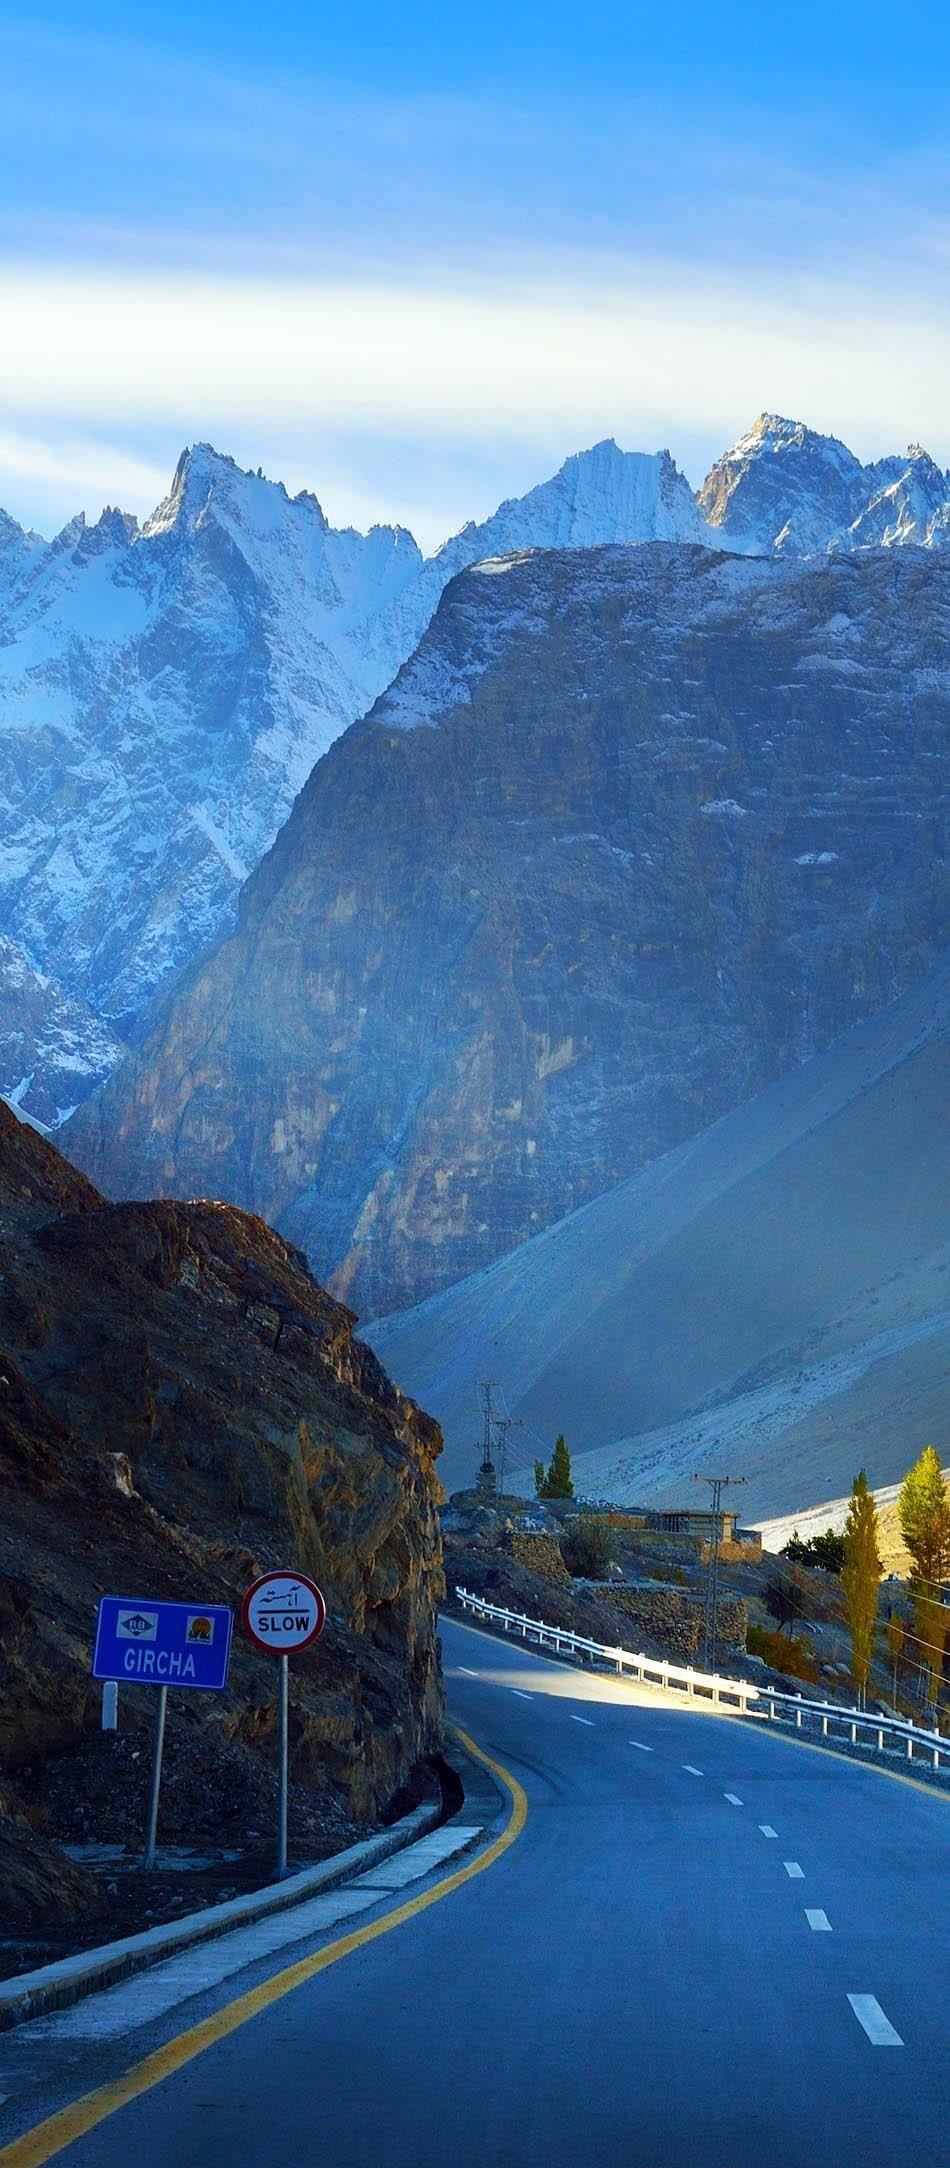 Karakorum highway. Autumn season in Northern Pakistan. | 23 Roads you Have to Drive in Your Lifetime